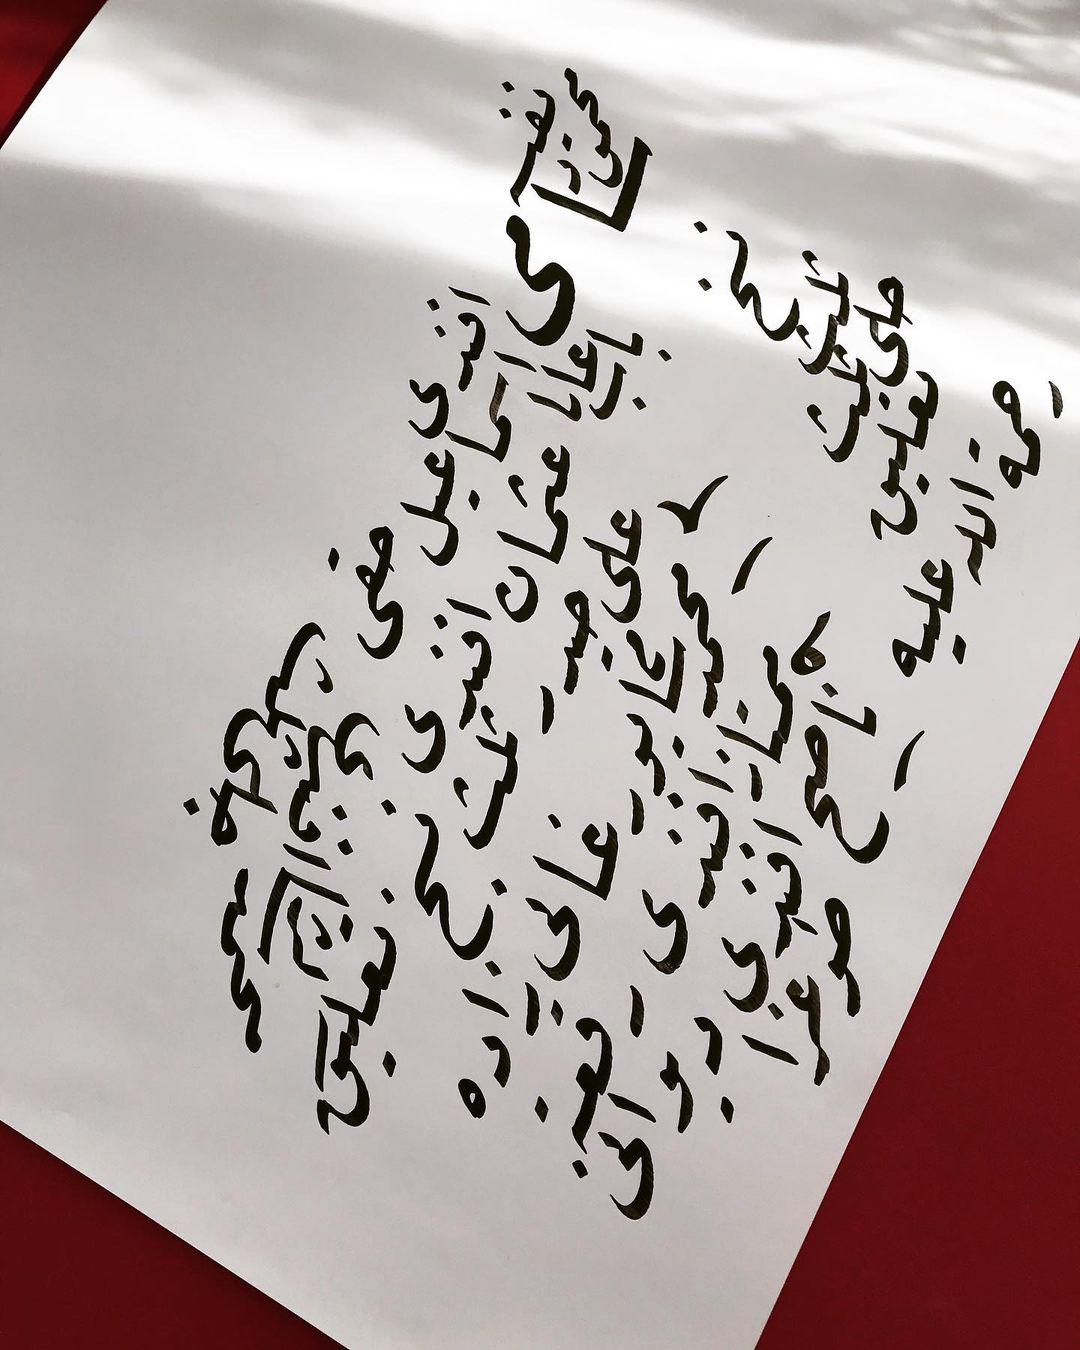 Donwload Photo Sami Efendi (1838-1912) #samiefendi #arabiccalligraphy #islamiccalligraphy #tezh…- hattat_aa